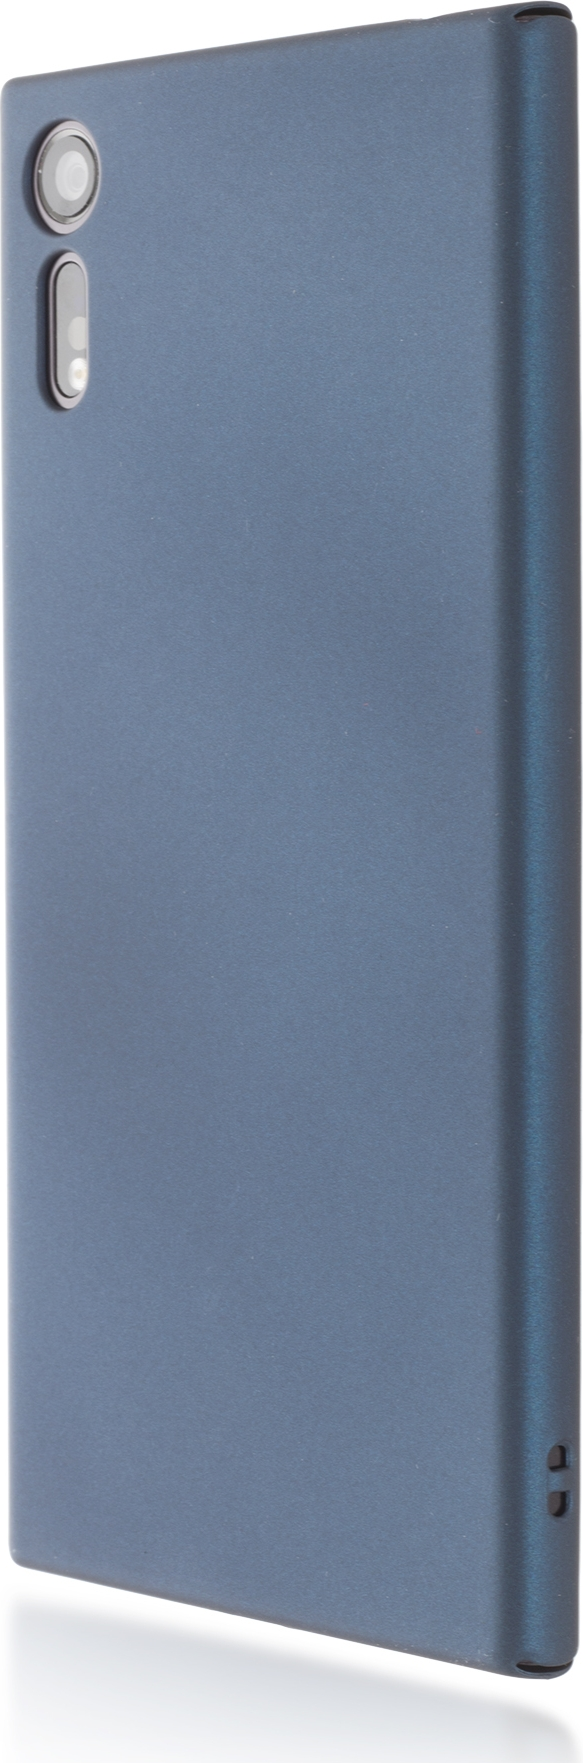 Чехол Brosco 4Side Soft-Touch для Sony Xperia XZ, голубой